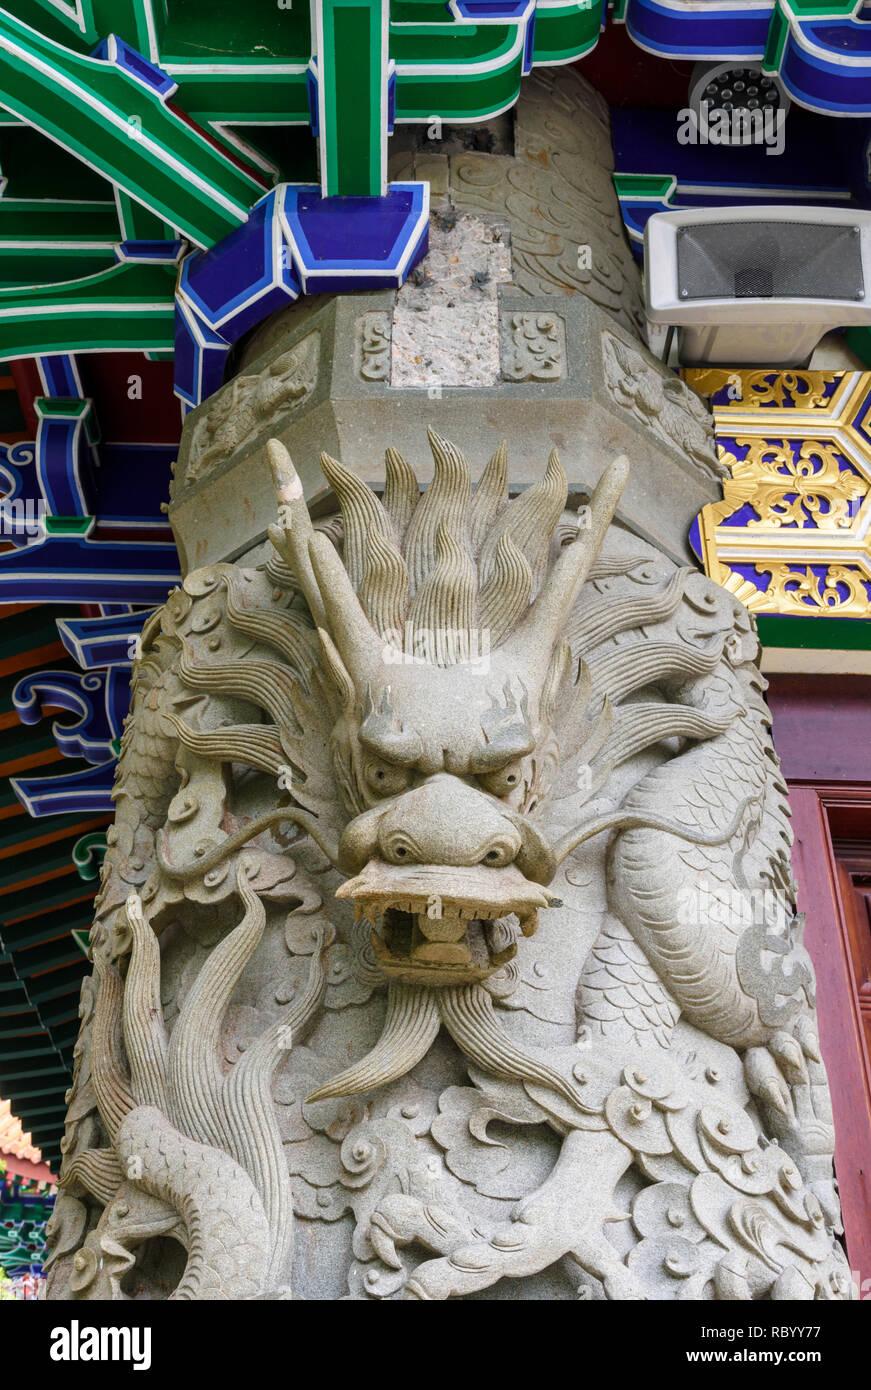 Serpent like creature detail at the Po Lin Monastery, Lantau Island, Hong Kong - Stock Image